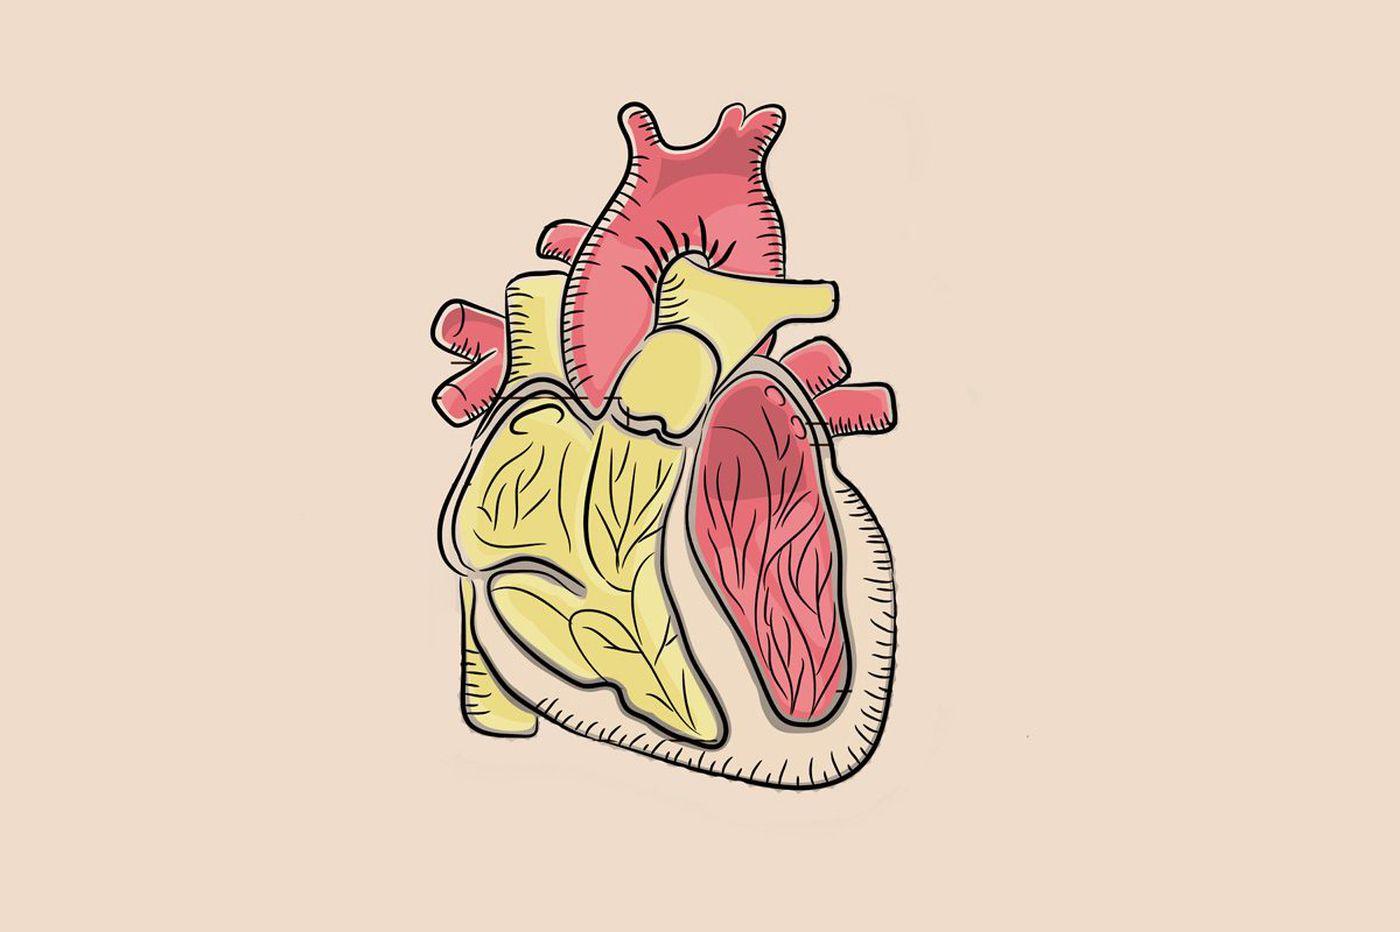 Temple scientist wins $1 million award to study how heart 'talks' to fat